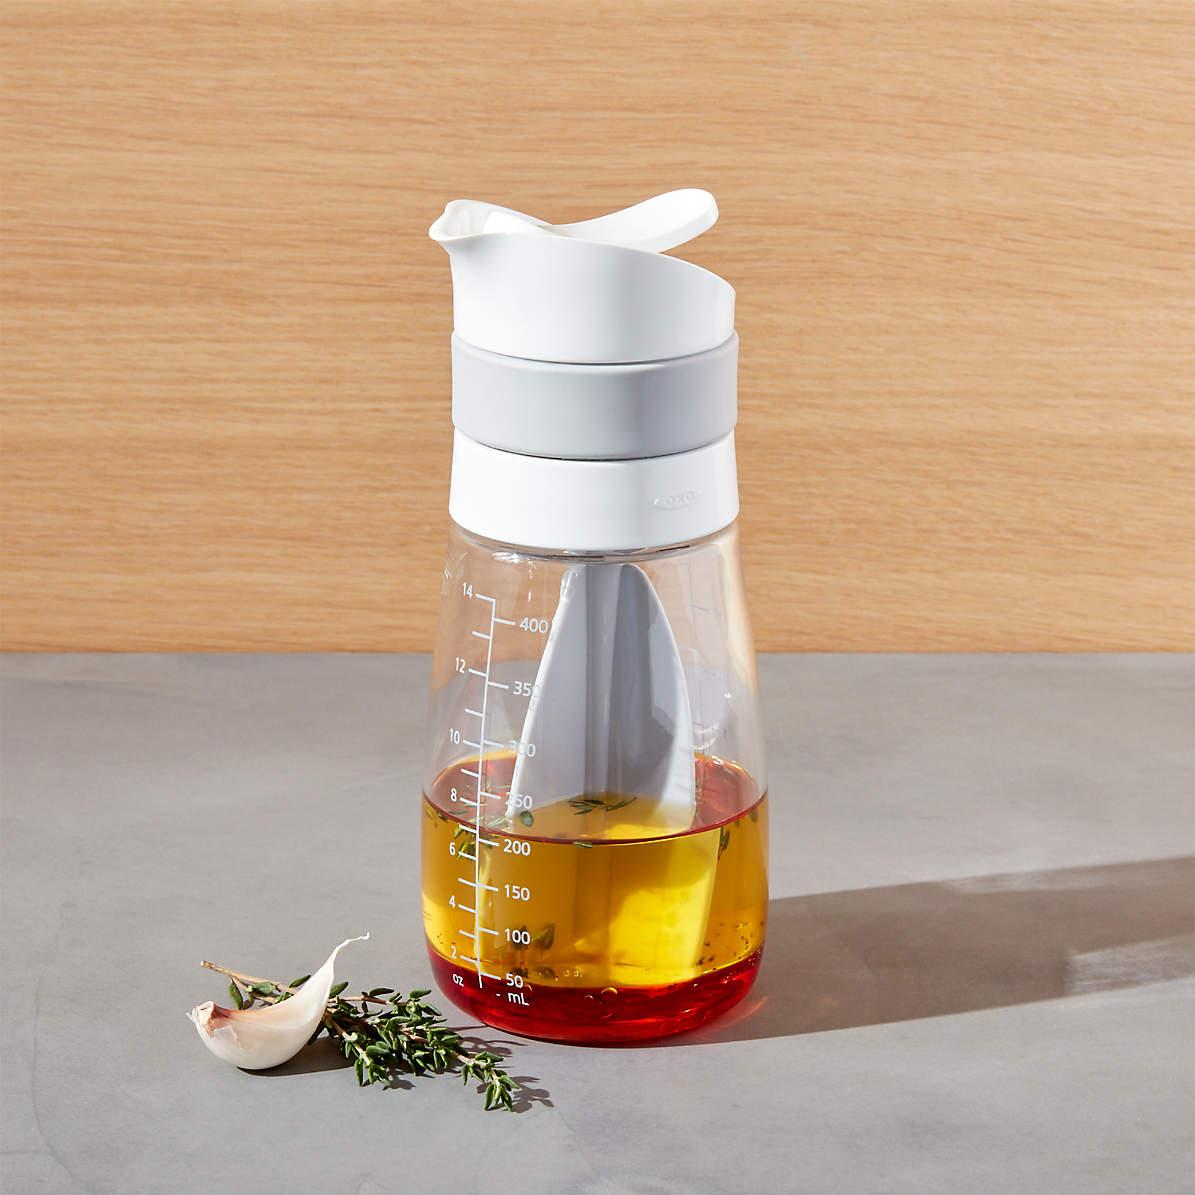 oxo twist pour salad dressing mixer